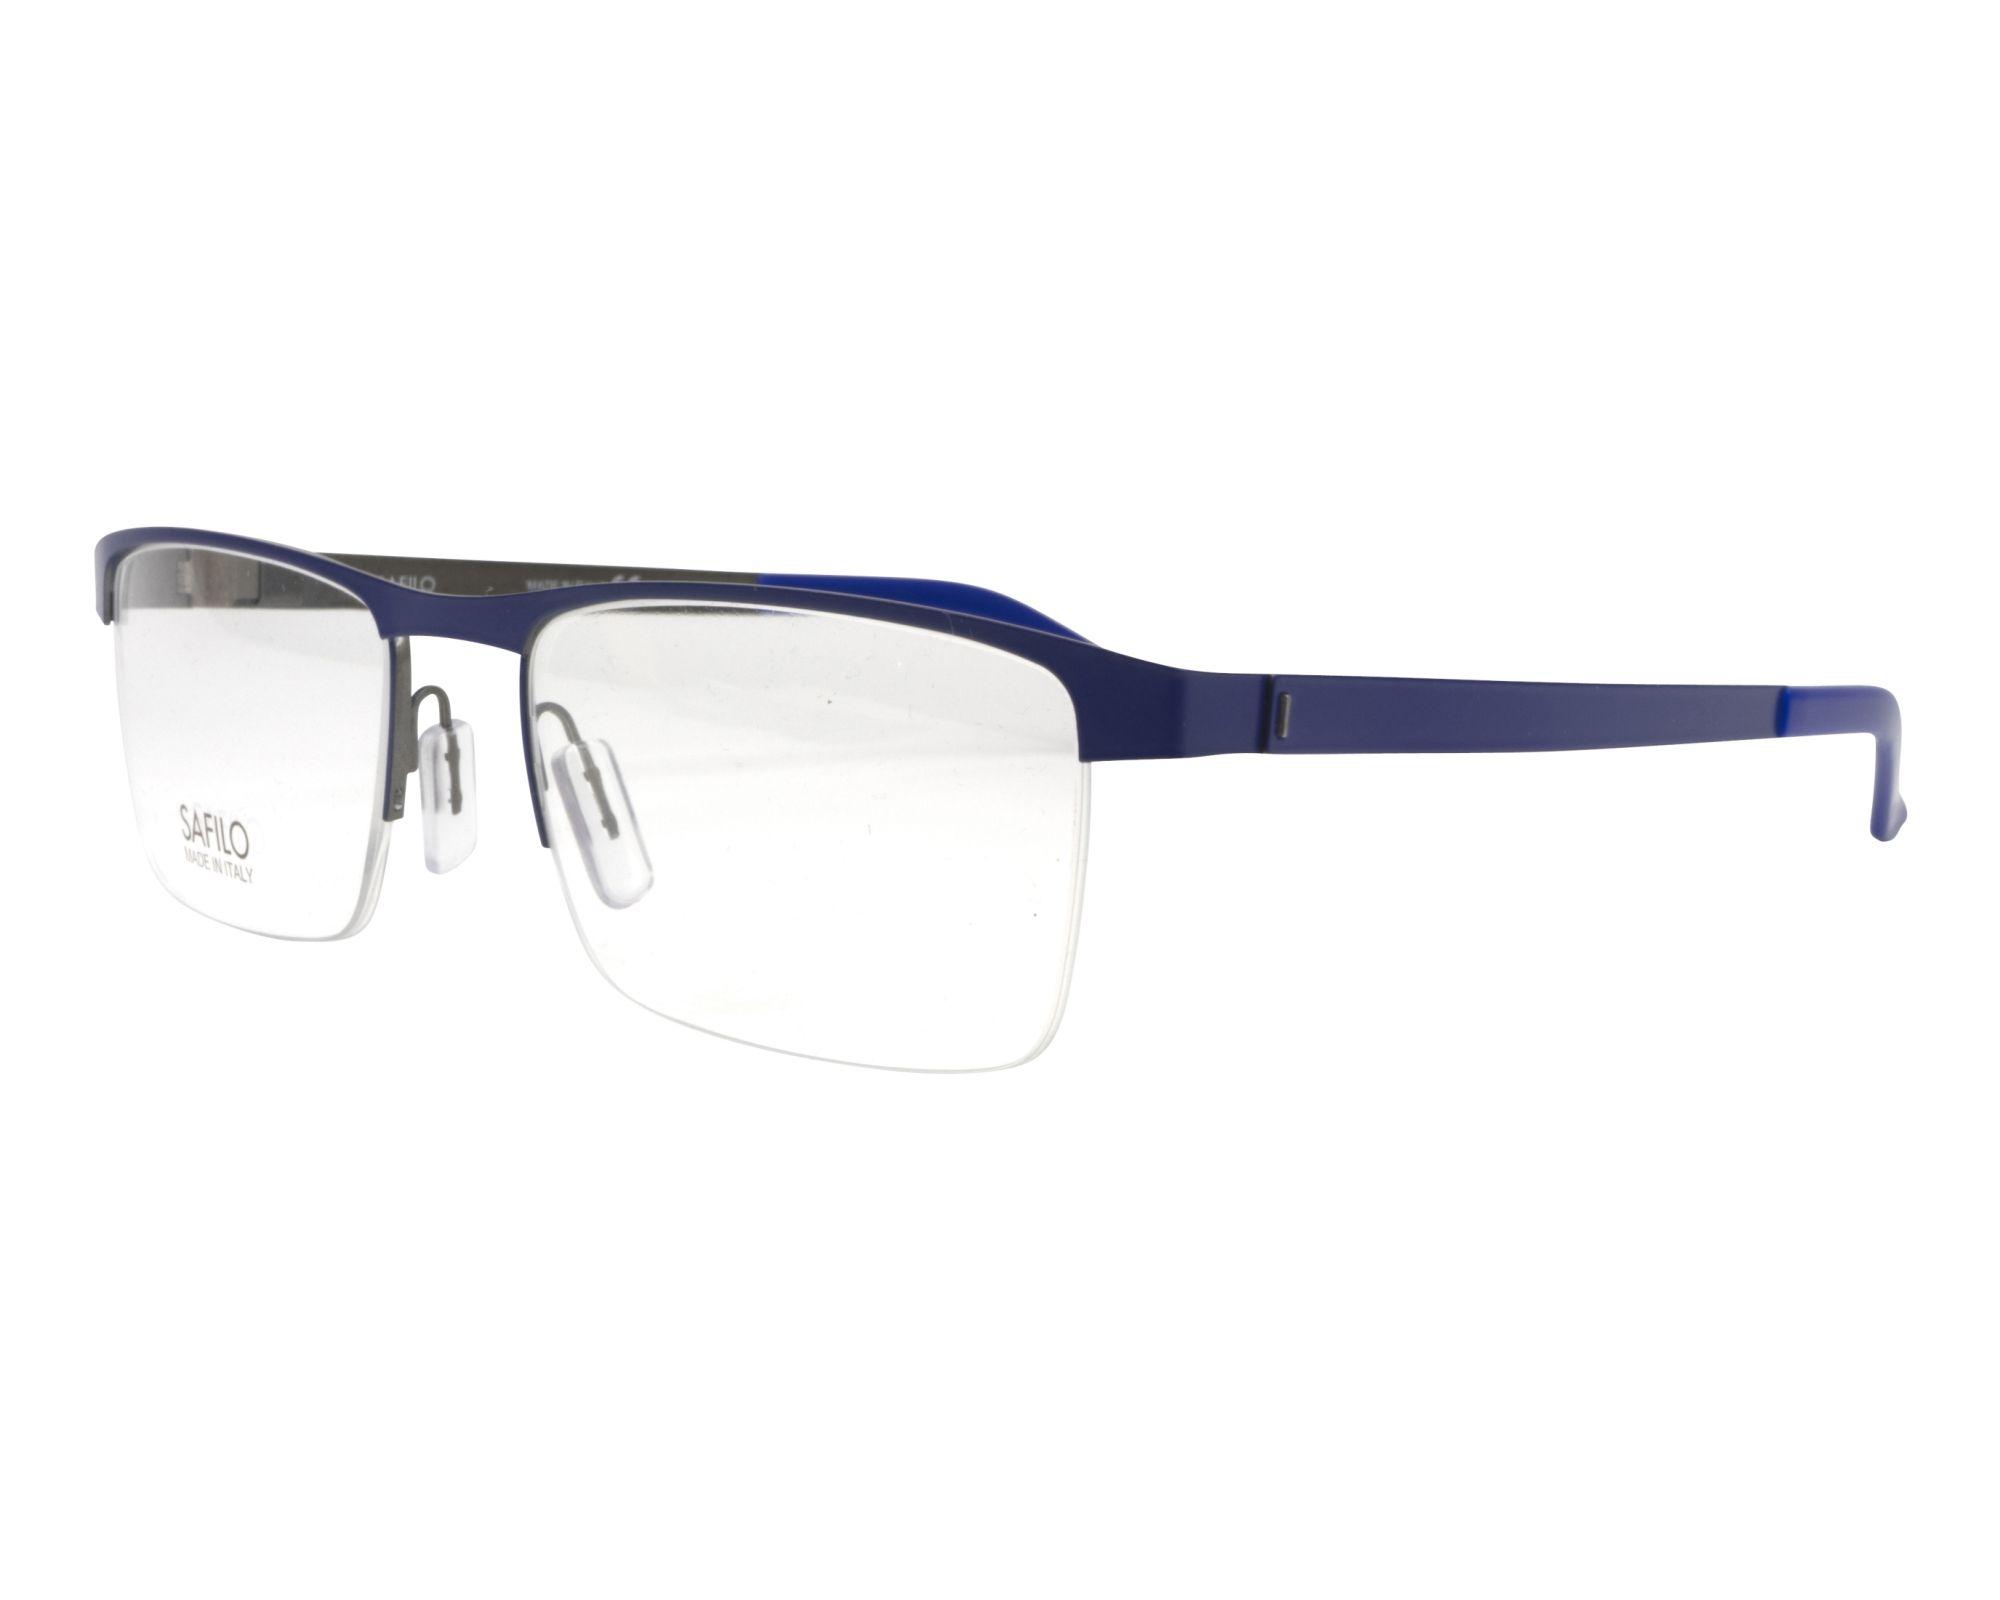 Safilo Eyeglasses SA-1057 VG7 Blue - Visionet UK